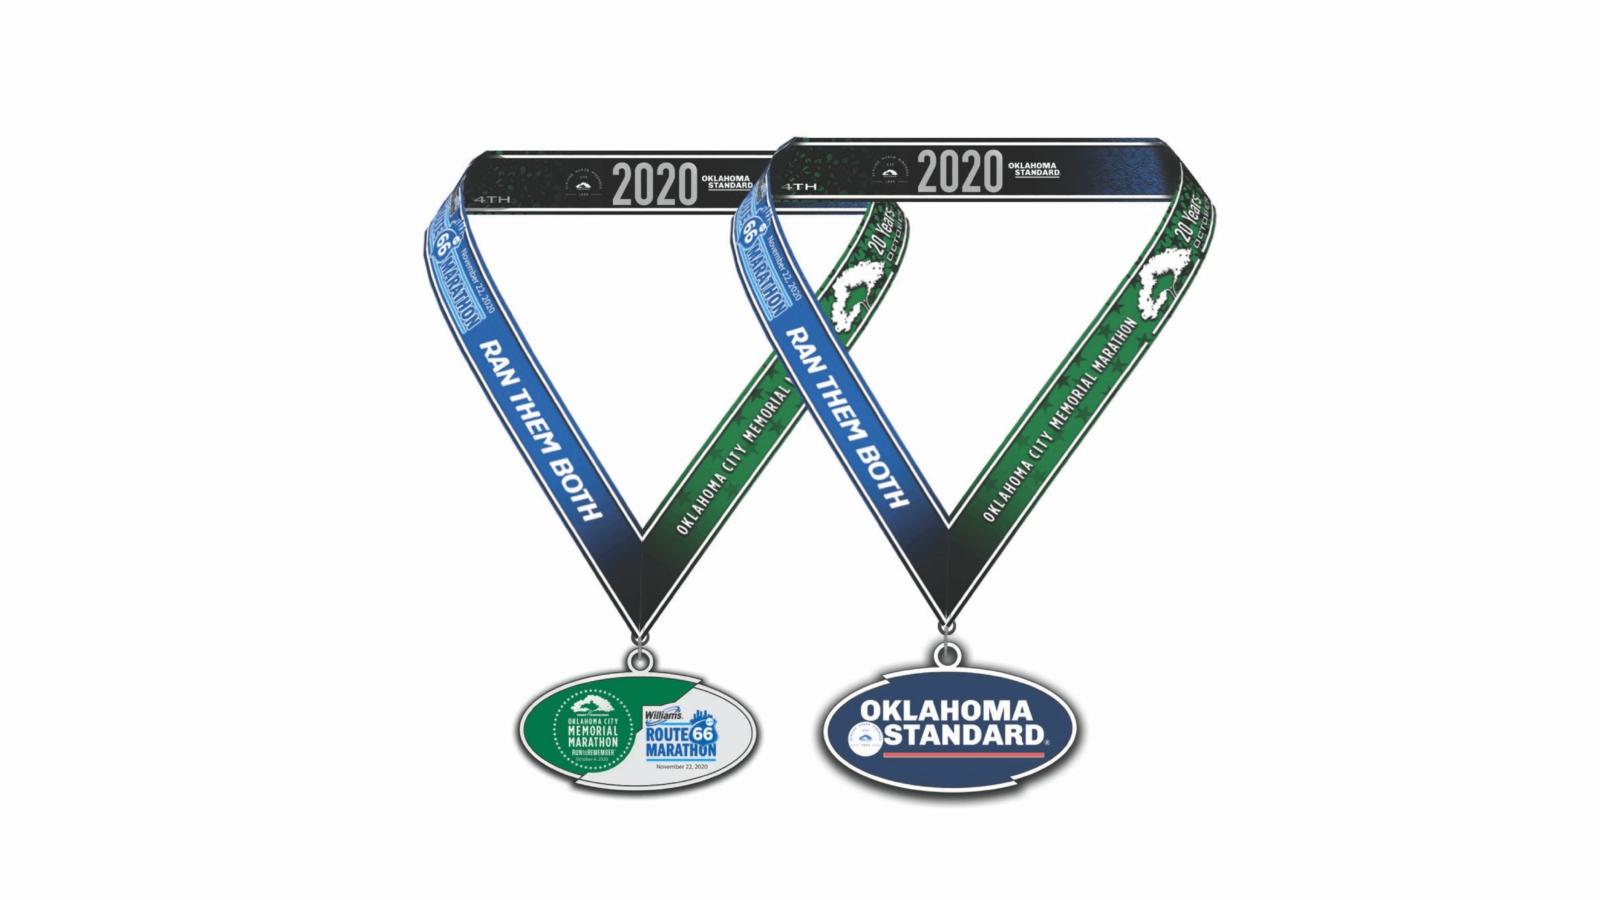 Oklahoma Marathon Series